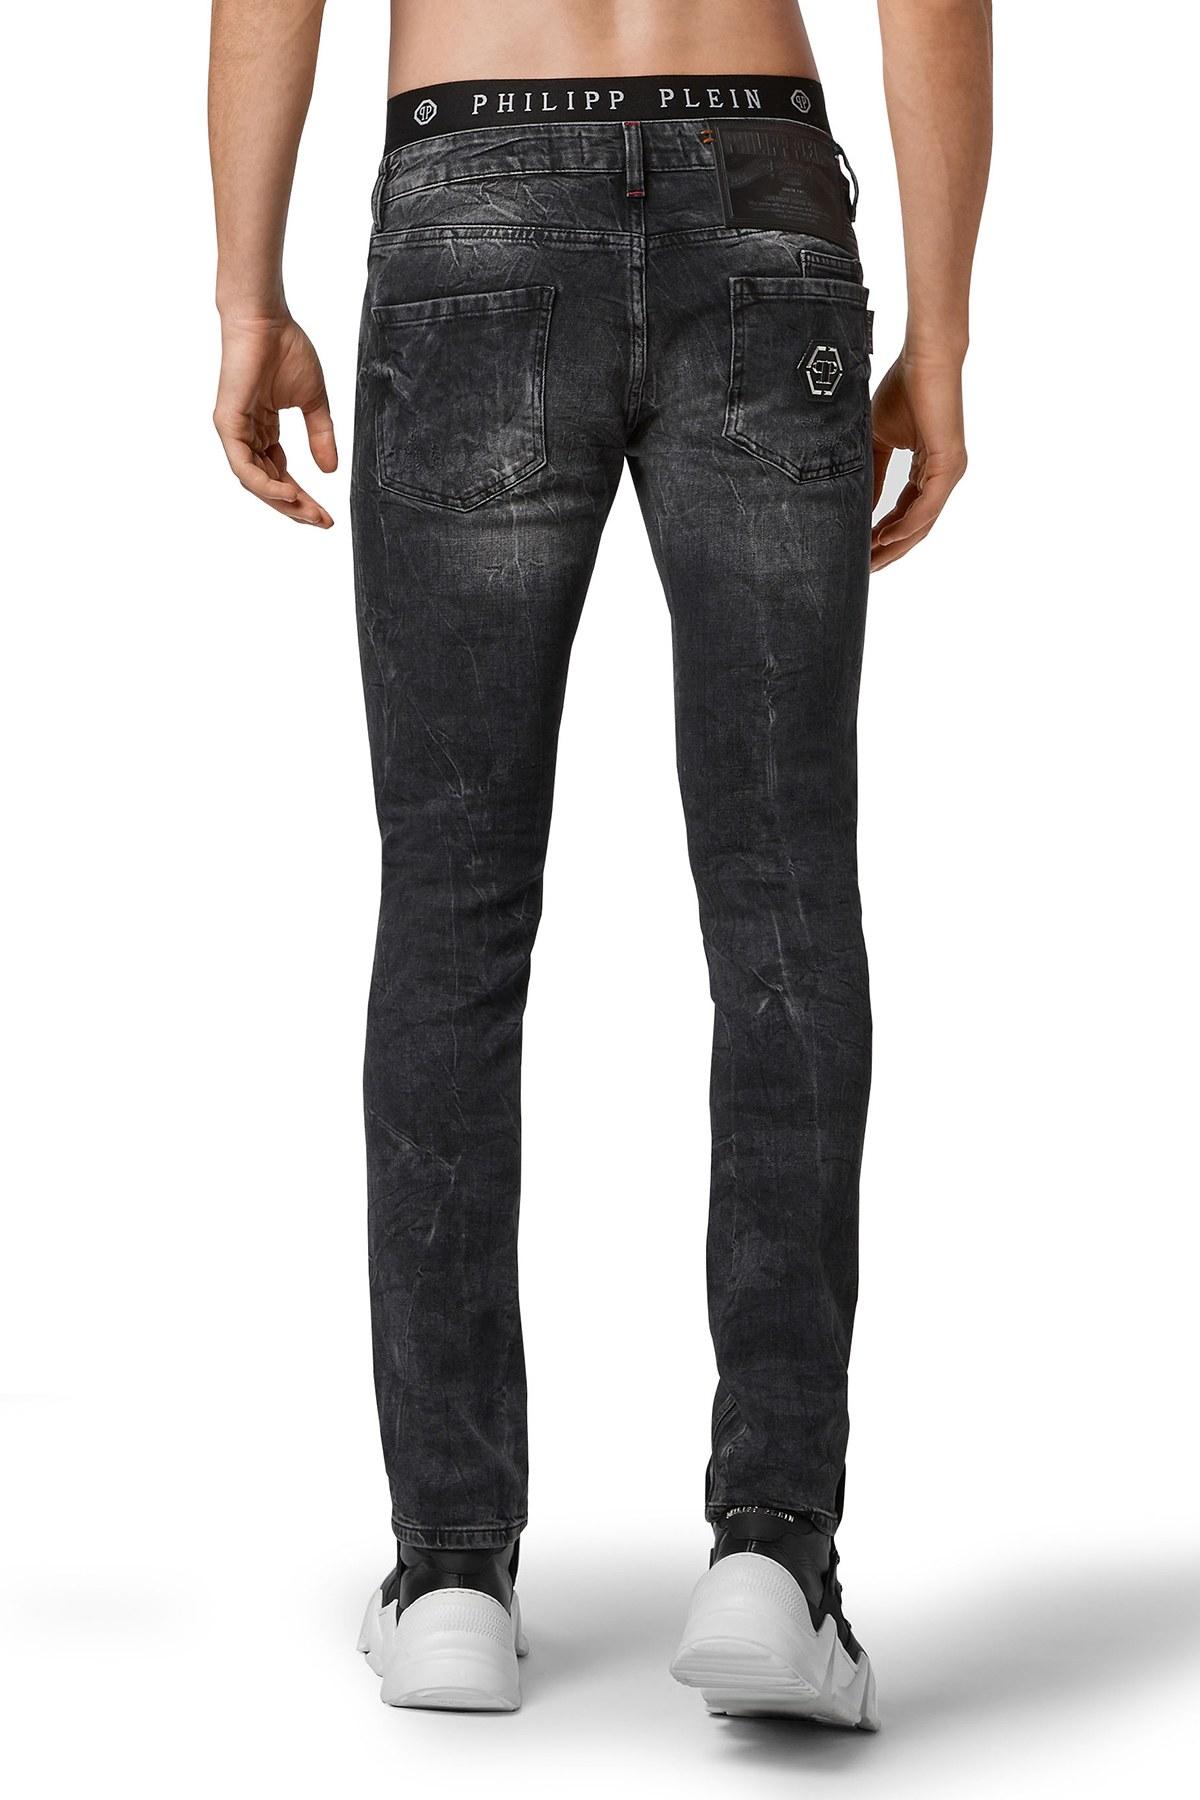 Philipp Plein Düz Kesim Normal Bel Jeans Erkek Kot Pantolon F20C MDT2301 PDE004N 10GO KOYU GRİ